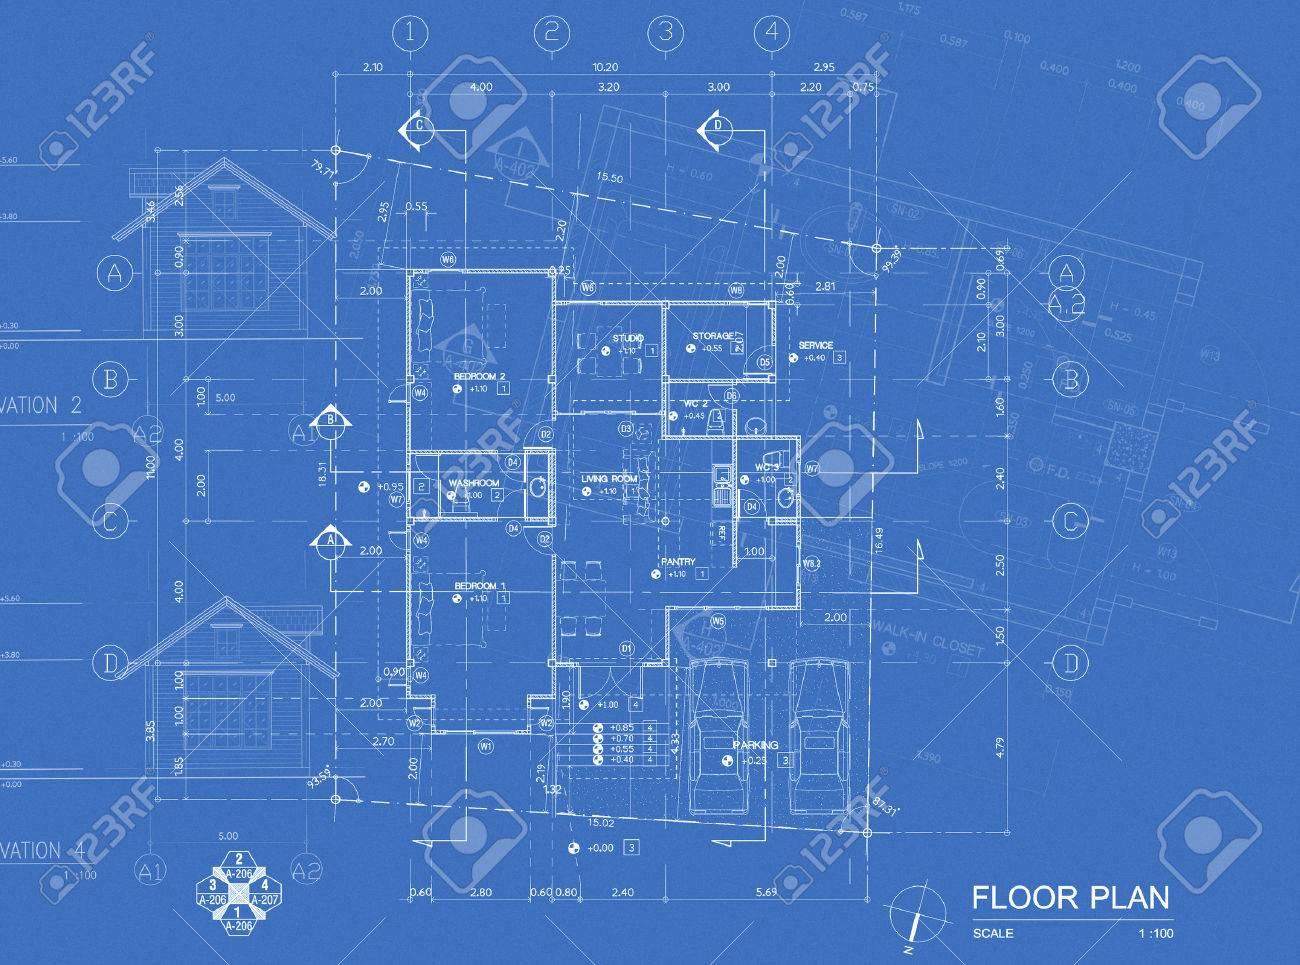 overlay of house blueprint floor plan elevations and washroom